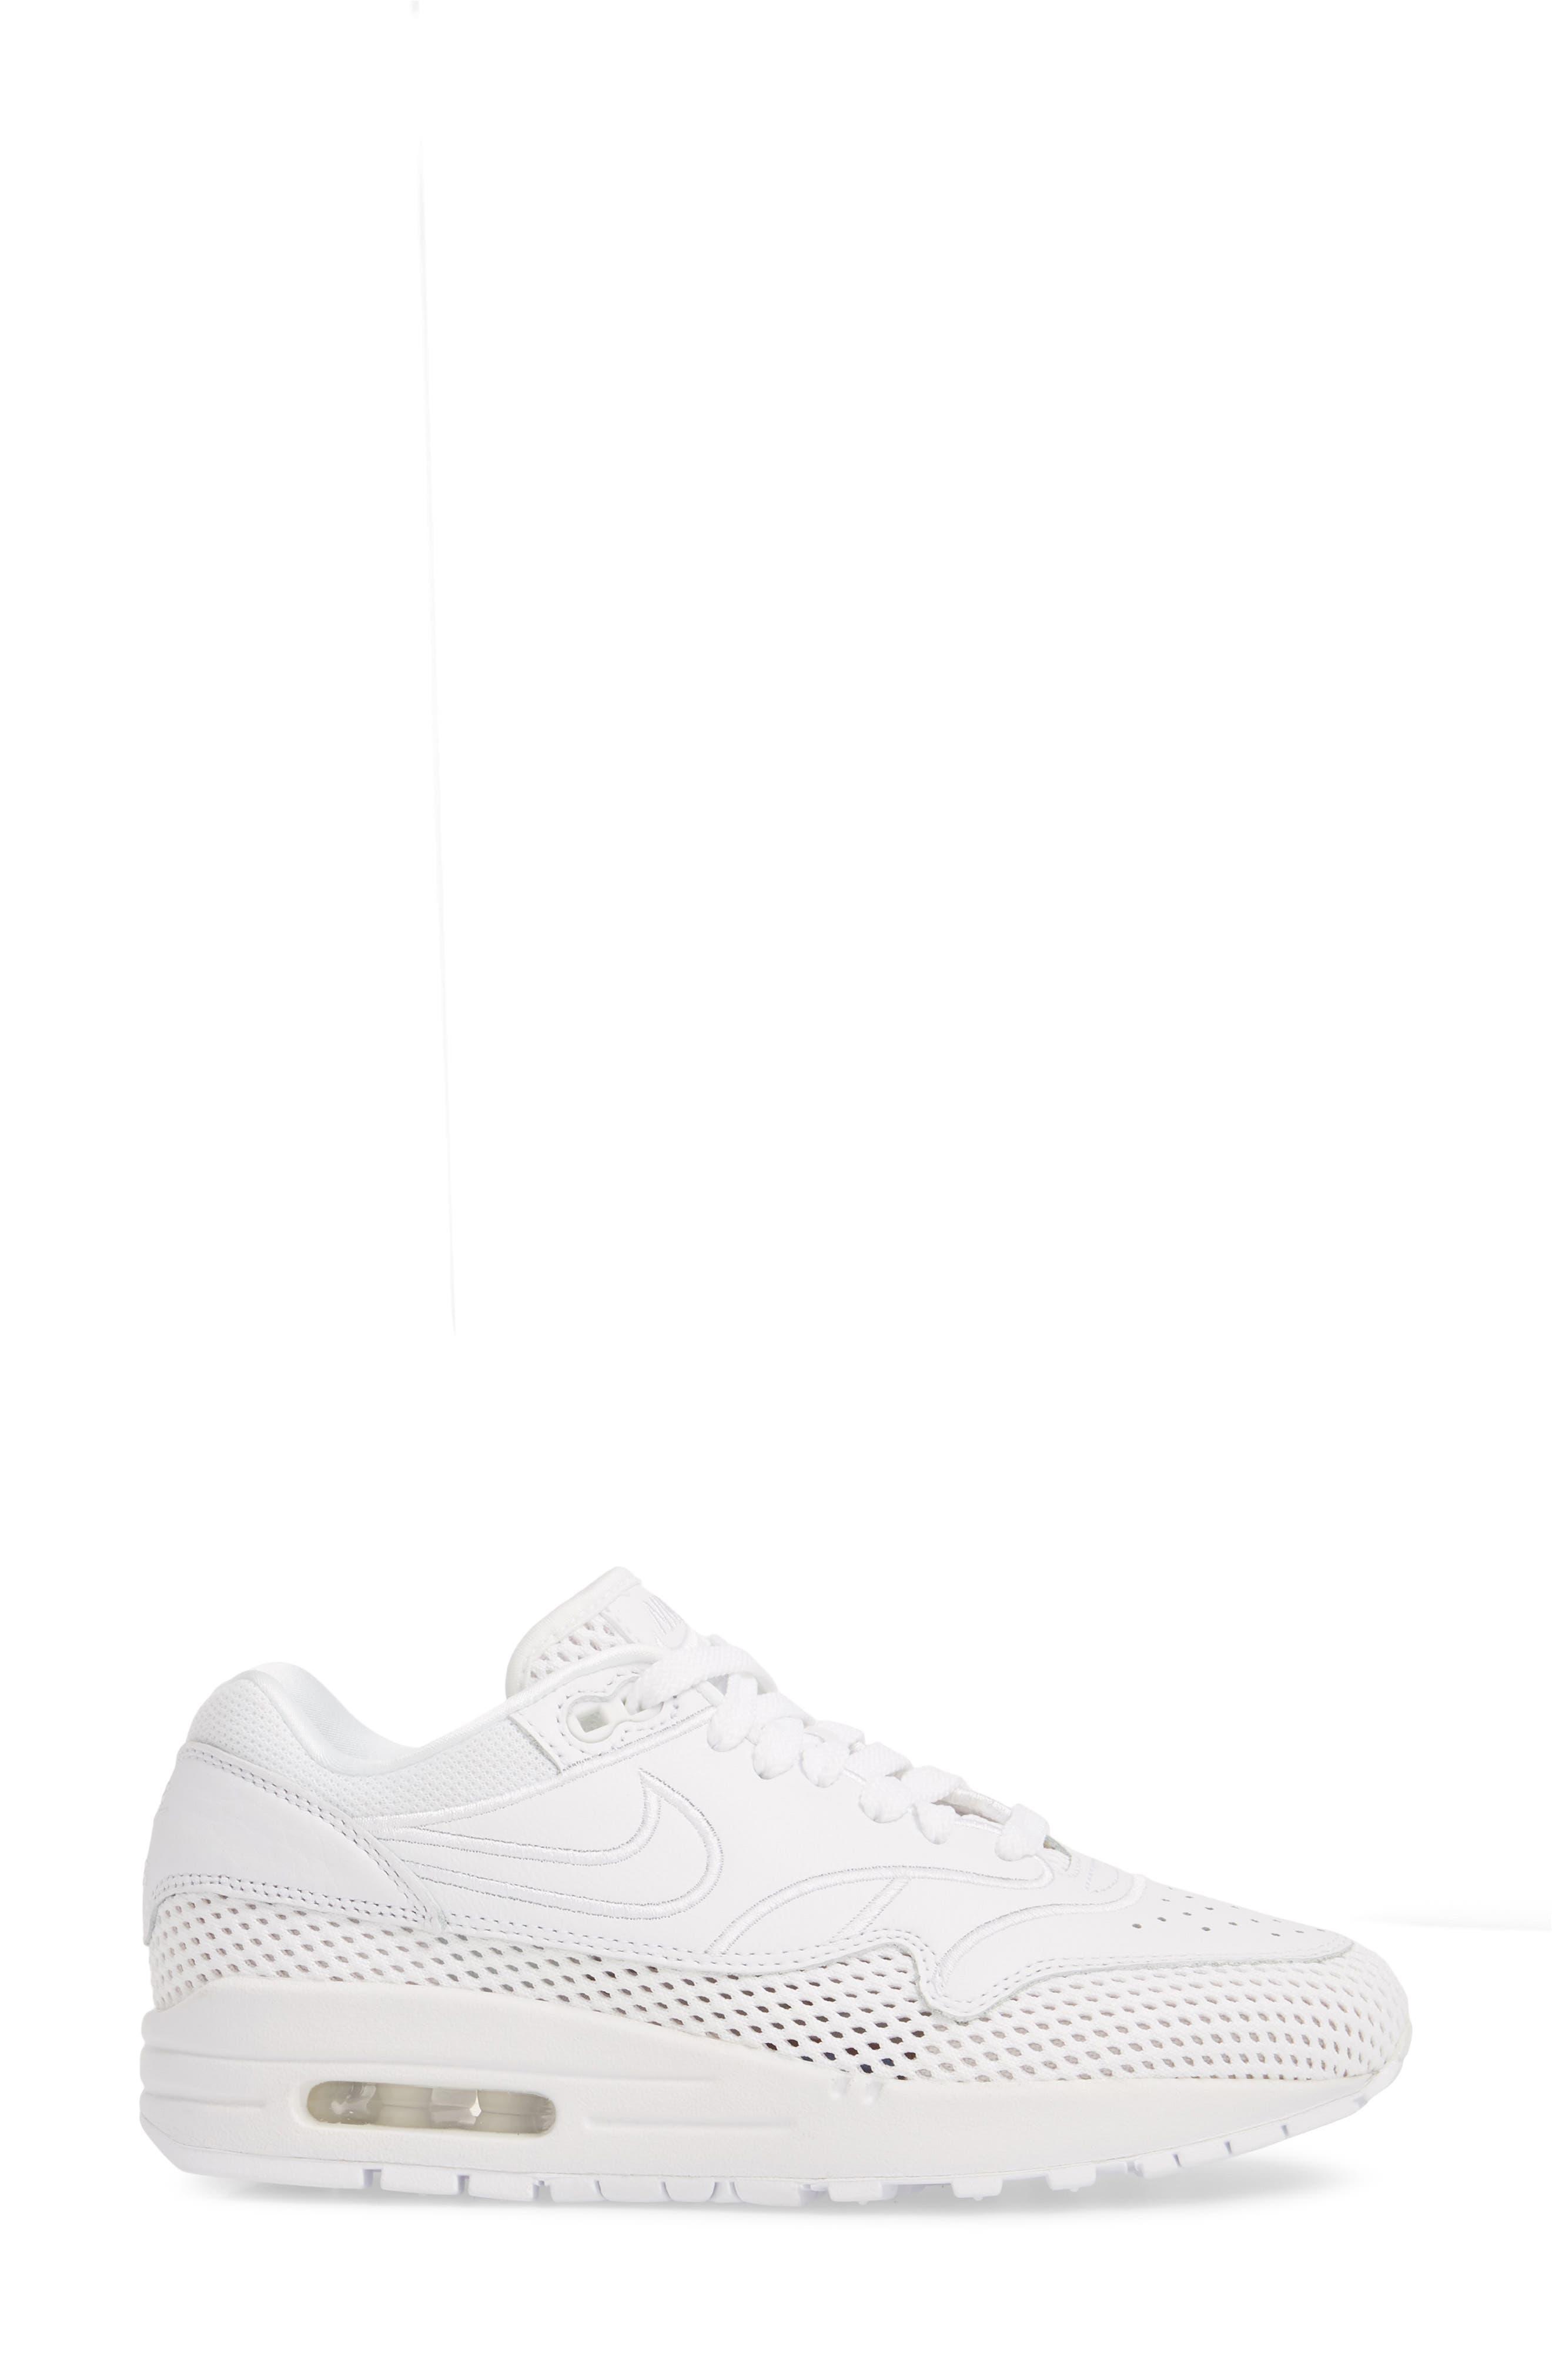 Air Max 1 SI Sneaker,                             Alternate thumbnail 3, color,                             100